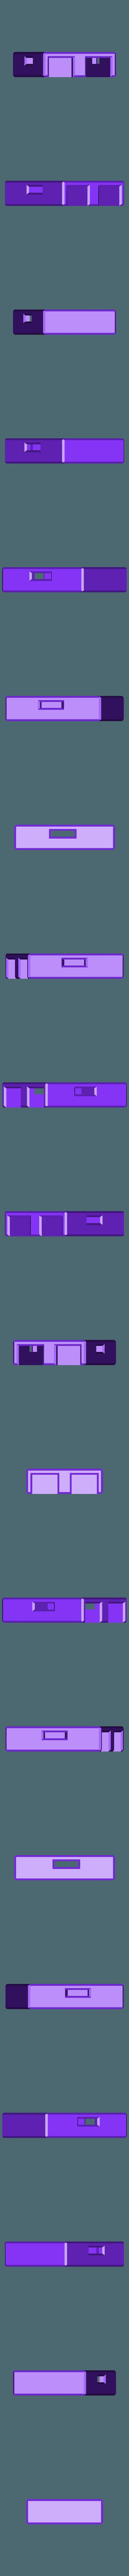 battholder gens ace 4000.stl Télécharger fichier STL Lipo 2S RX battery holder gens ace 4000 • Design imprimable en 3D, 3DDrone